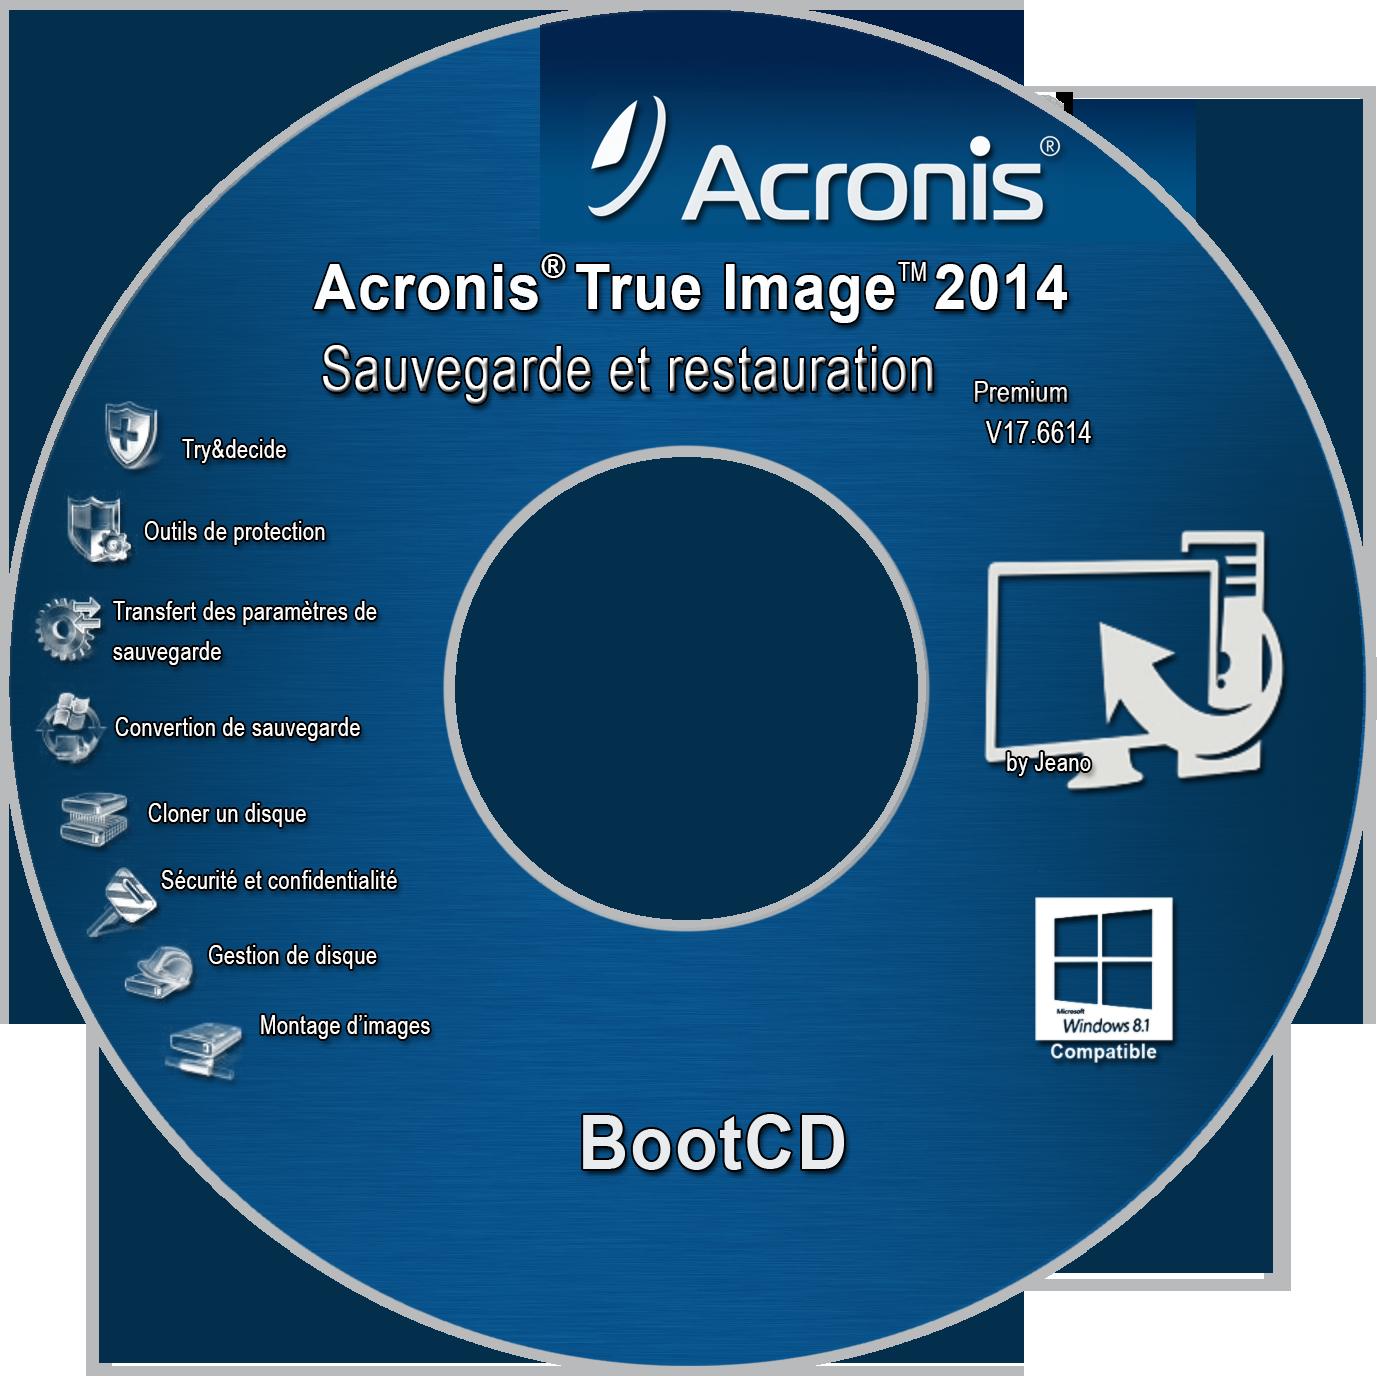 Cover CD Recovery Acronis True Image 2014 Premium by zeanoel on DeviantArt